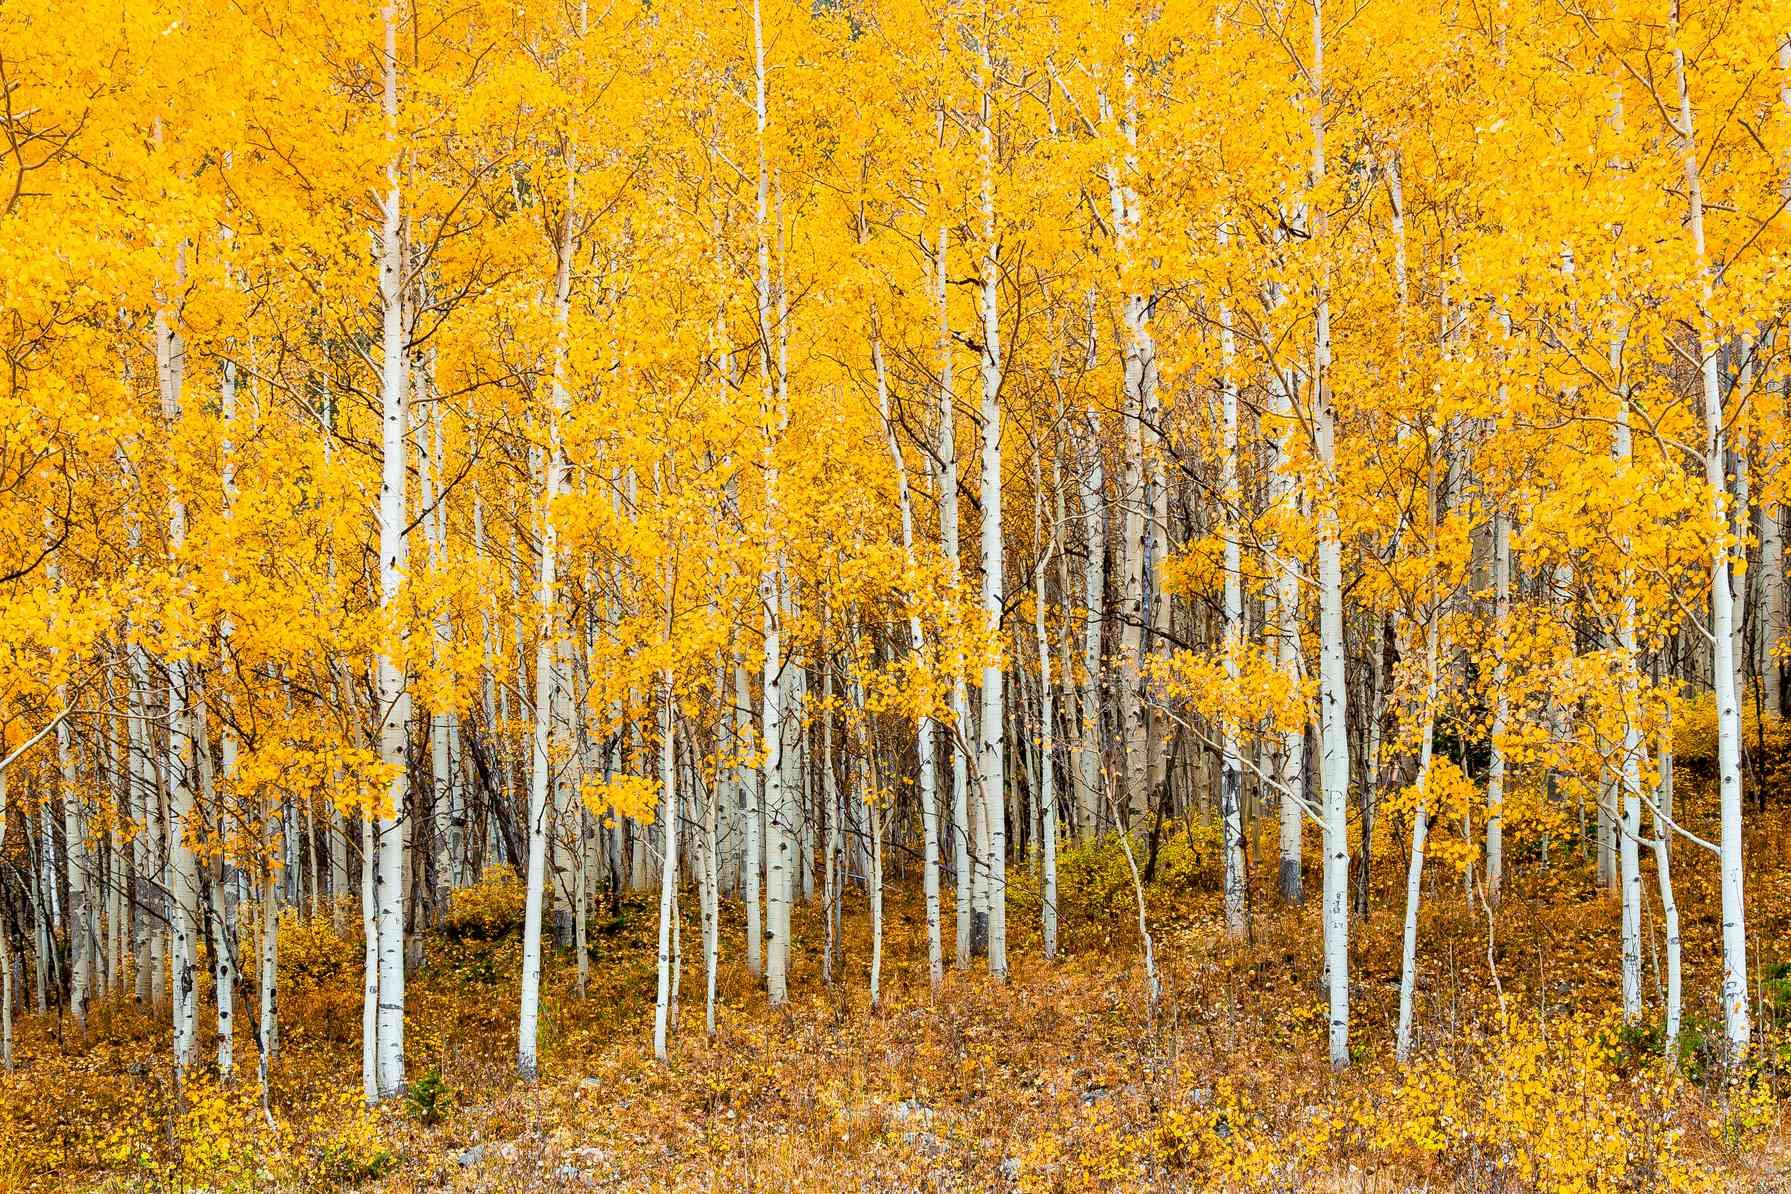 Bright-yellow quaking aspen grove during autumn